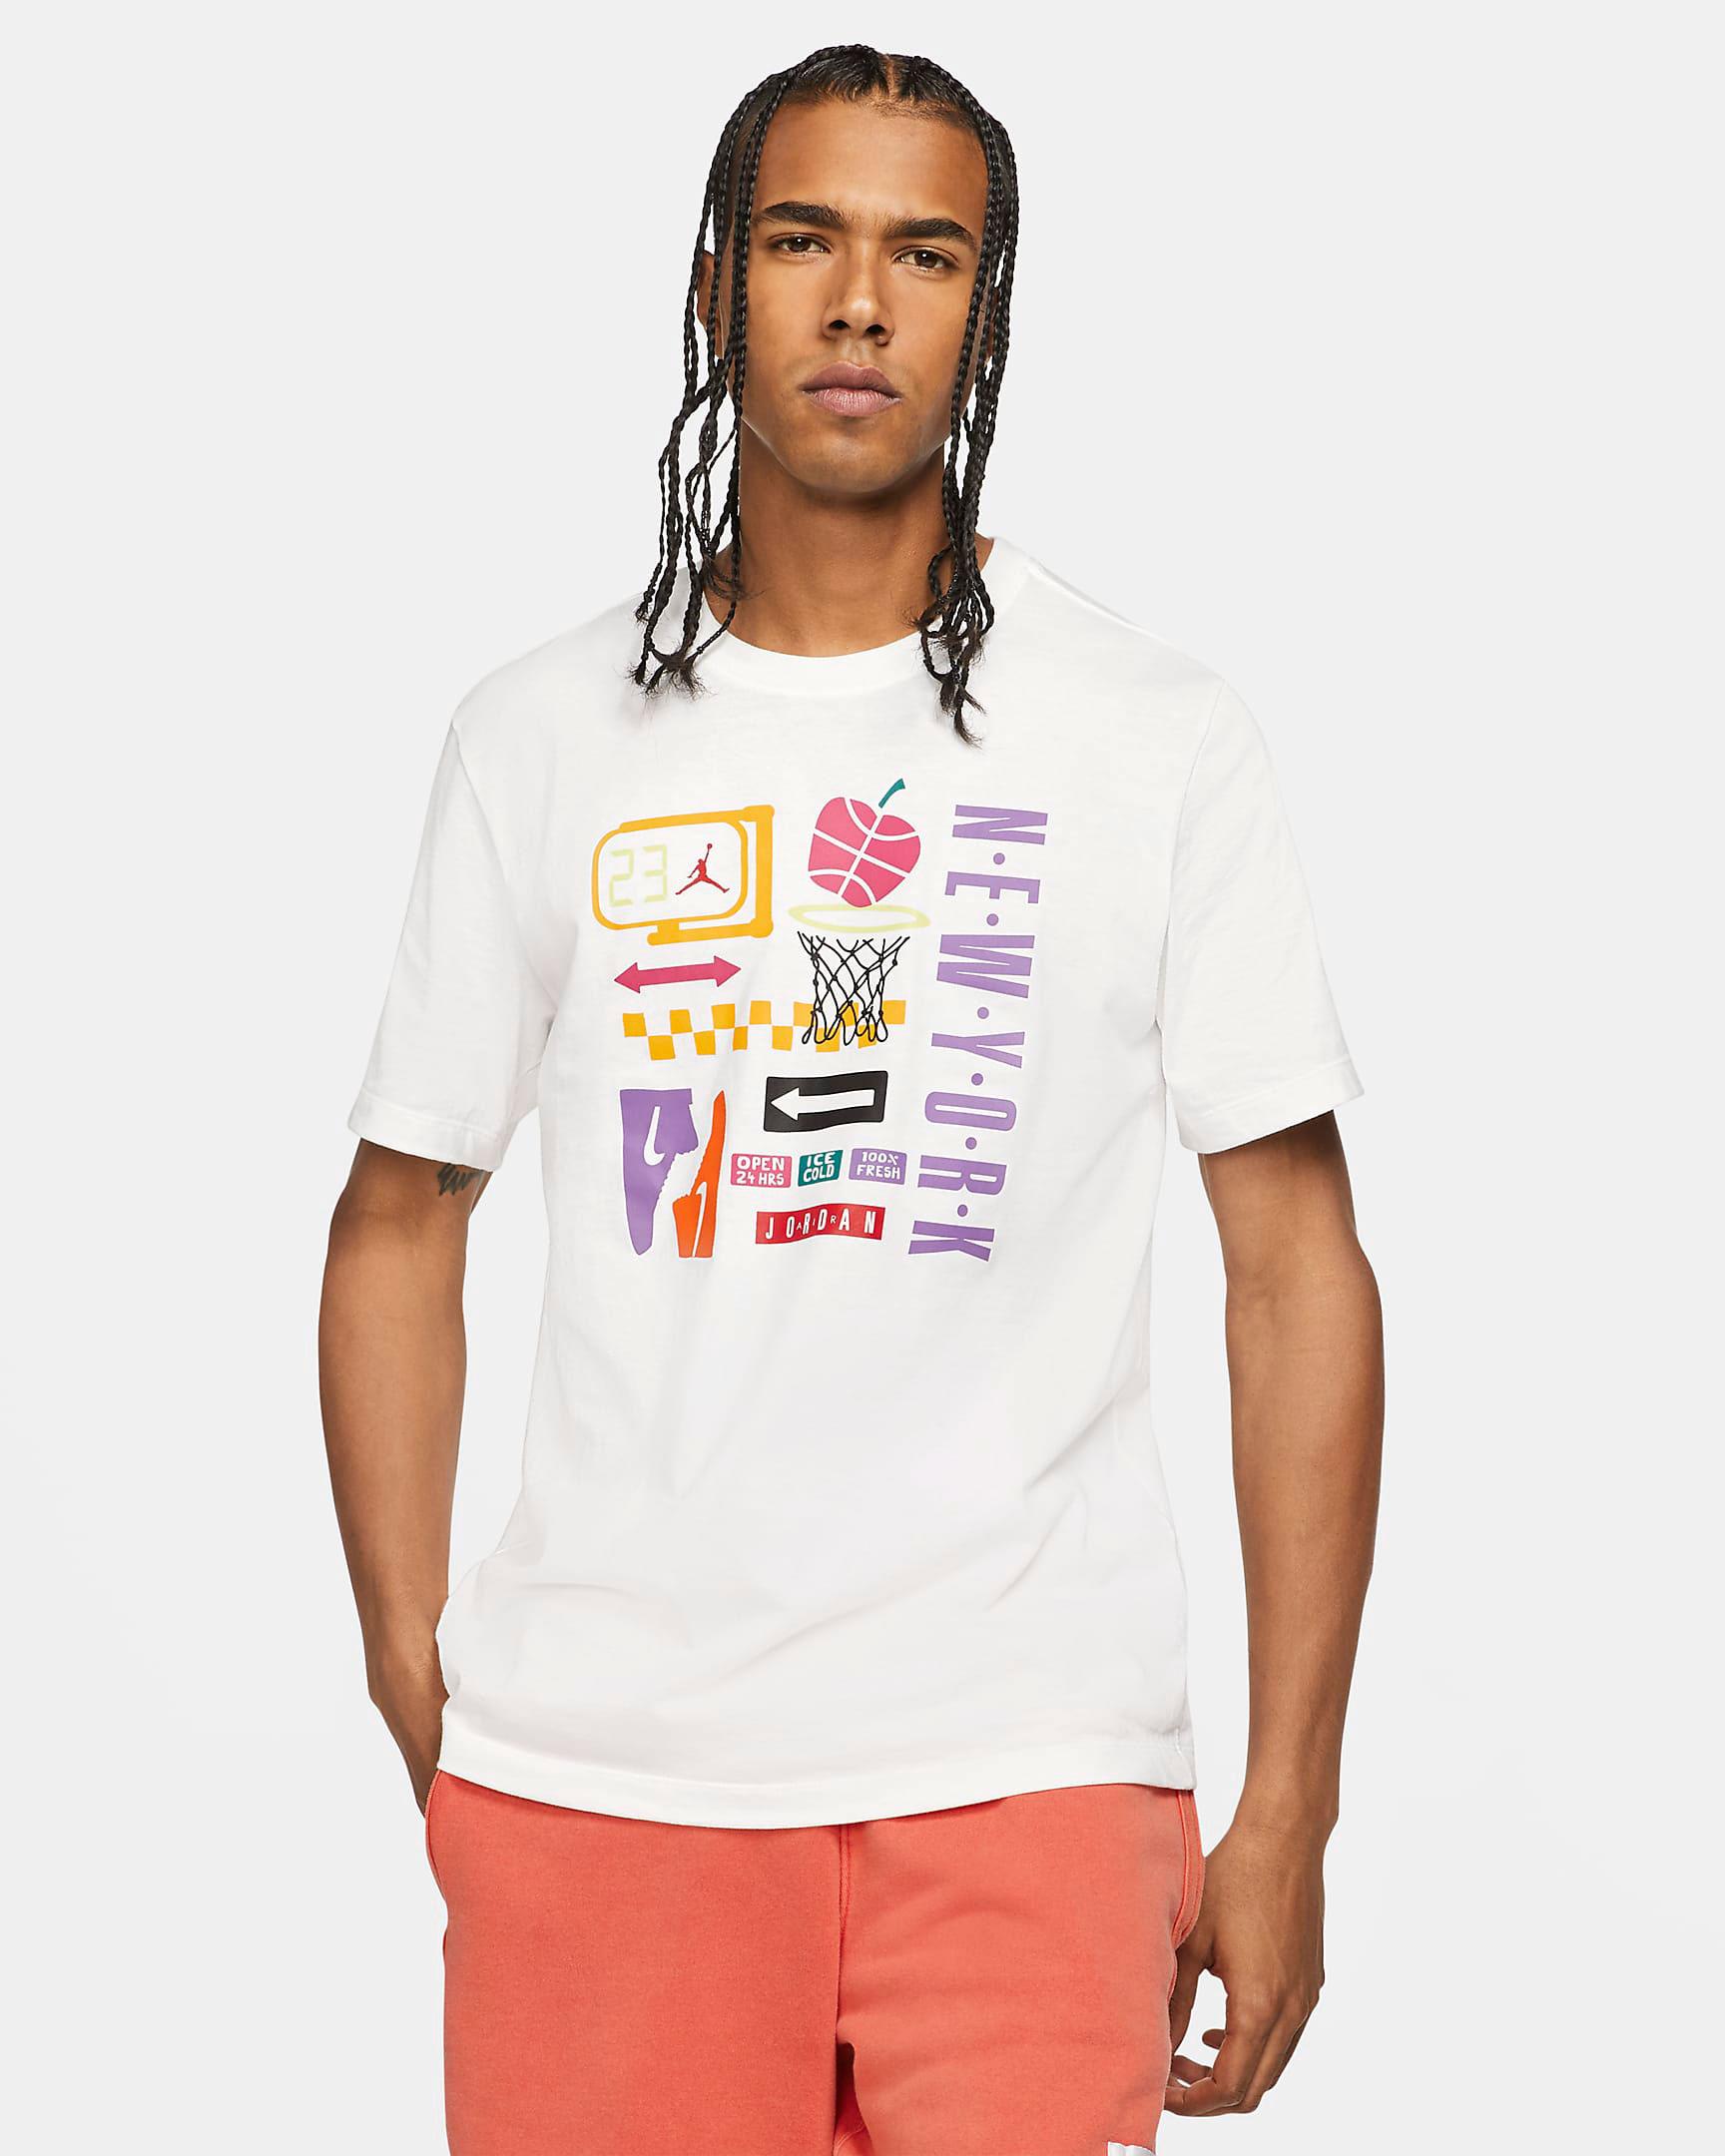 air-jordan-5-what-the-new-york-nyc-tee-shirt-white